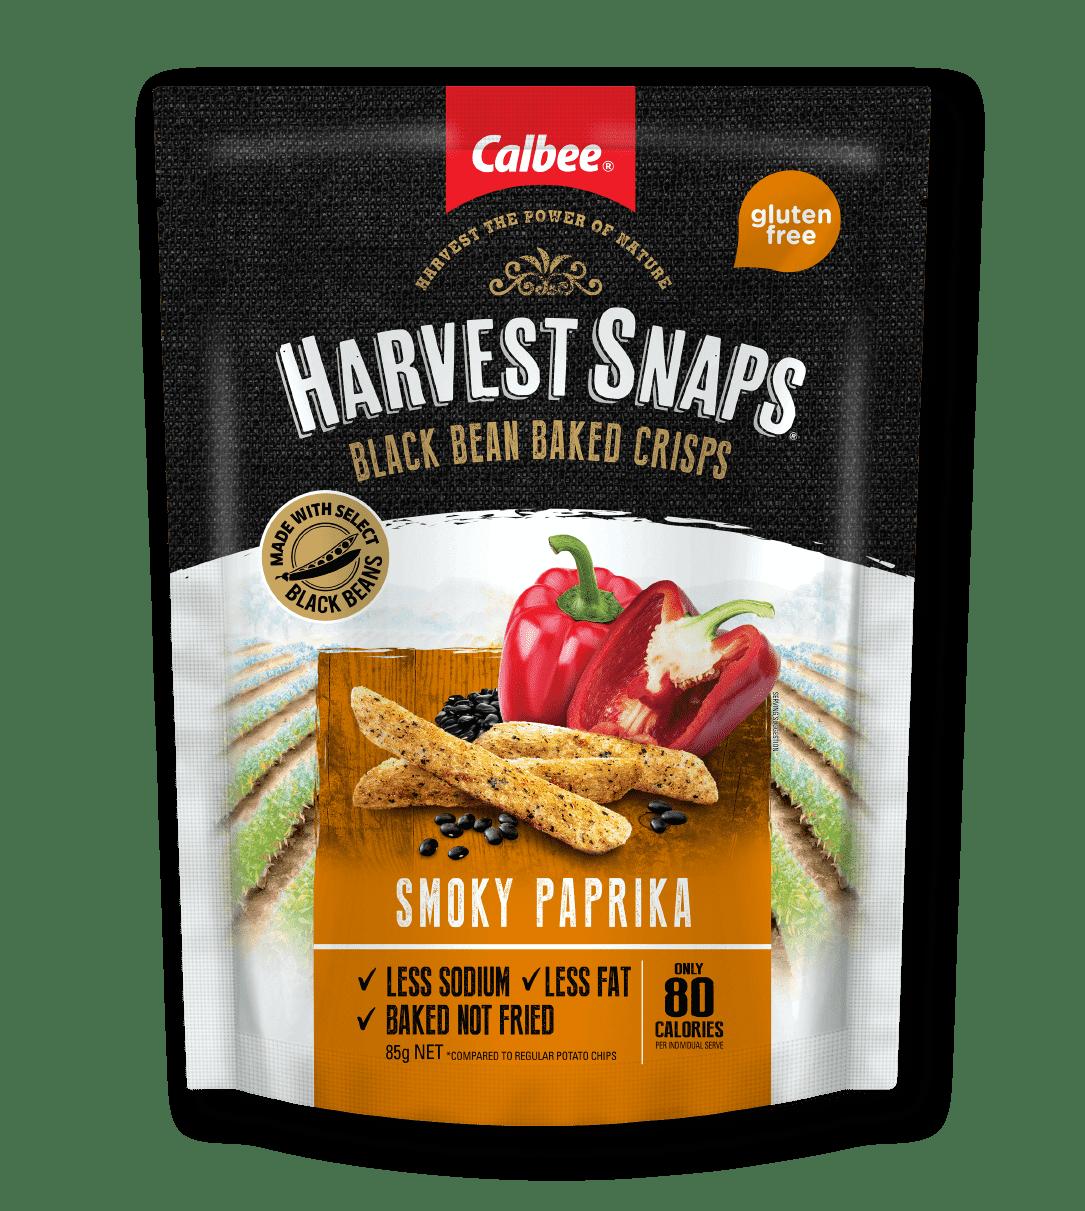 Calbee Australia - Harvest Snaps Smoky Paprika Black Bean